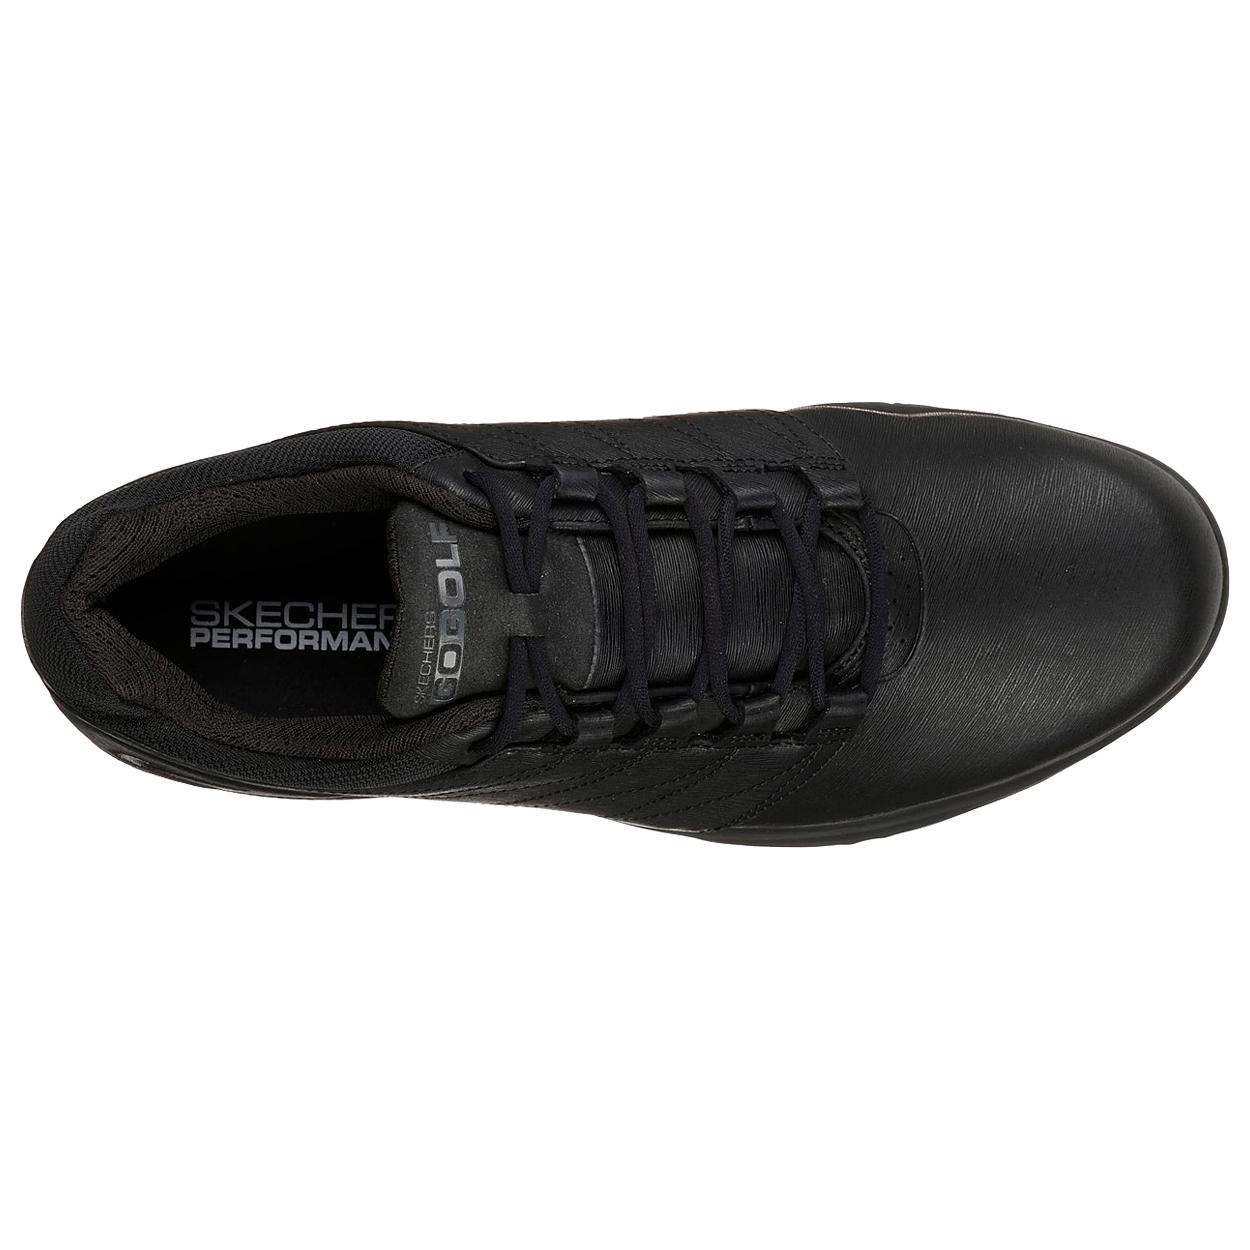 Skechers-Men-039-s-GOgolf-Pro-4-LX-Leather-Golf-Shoe-Brand-New thumbnail 8